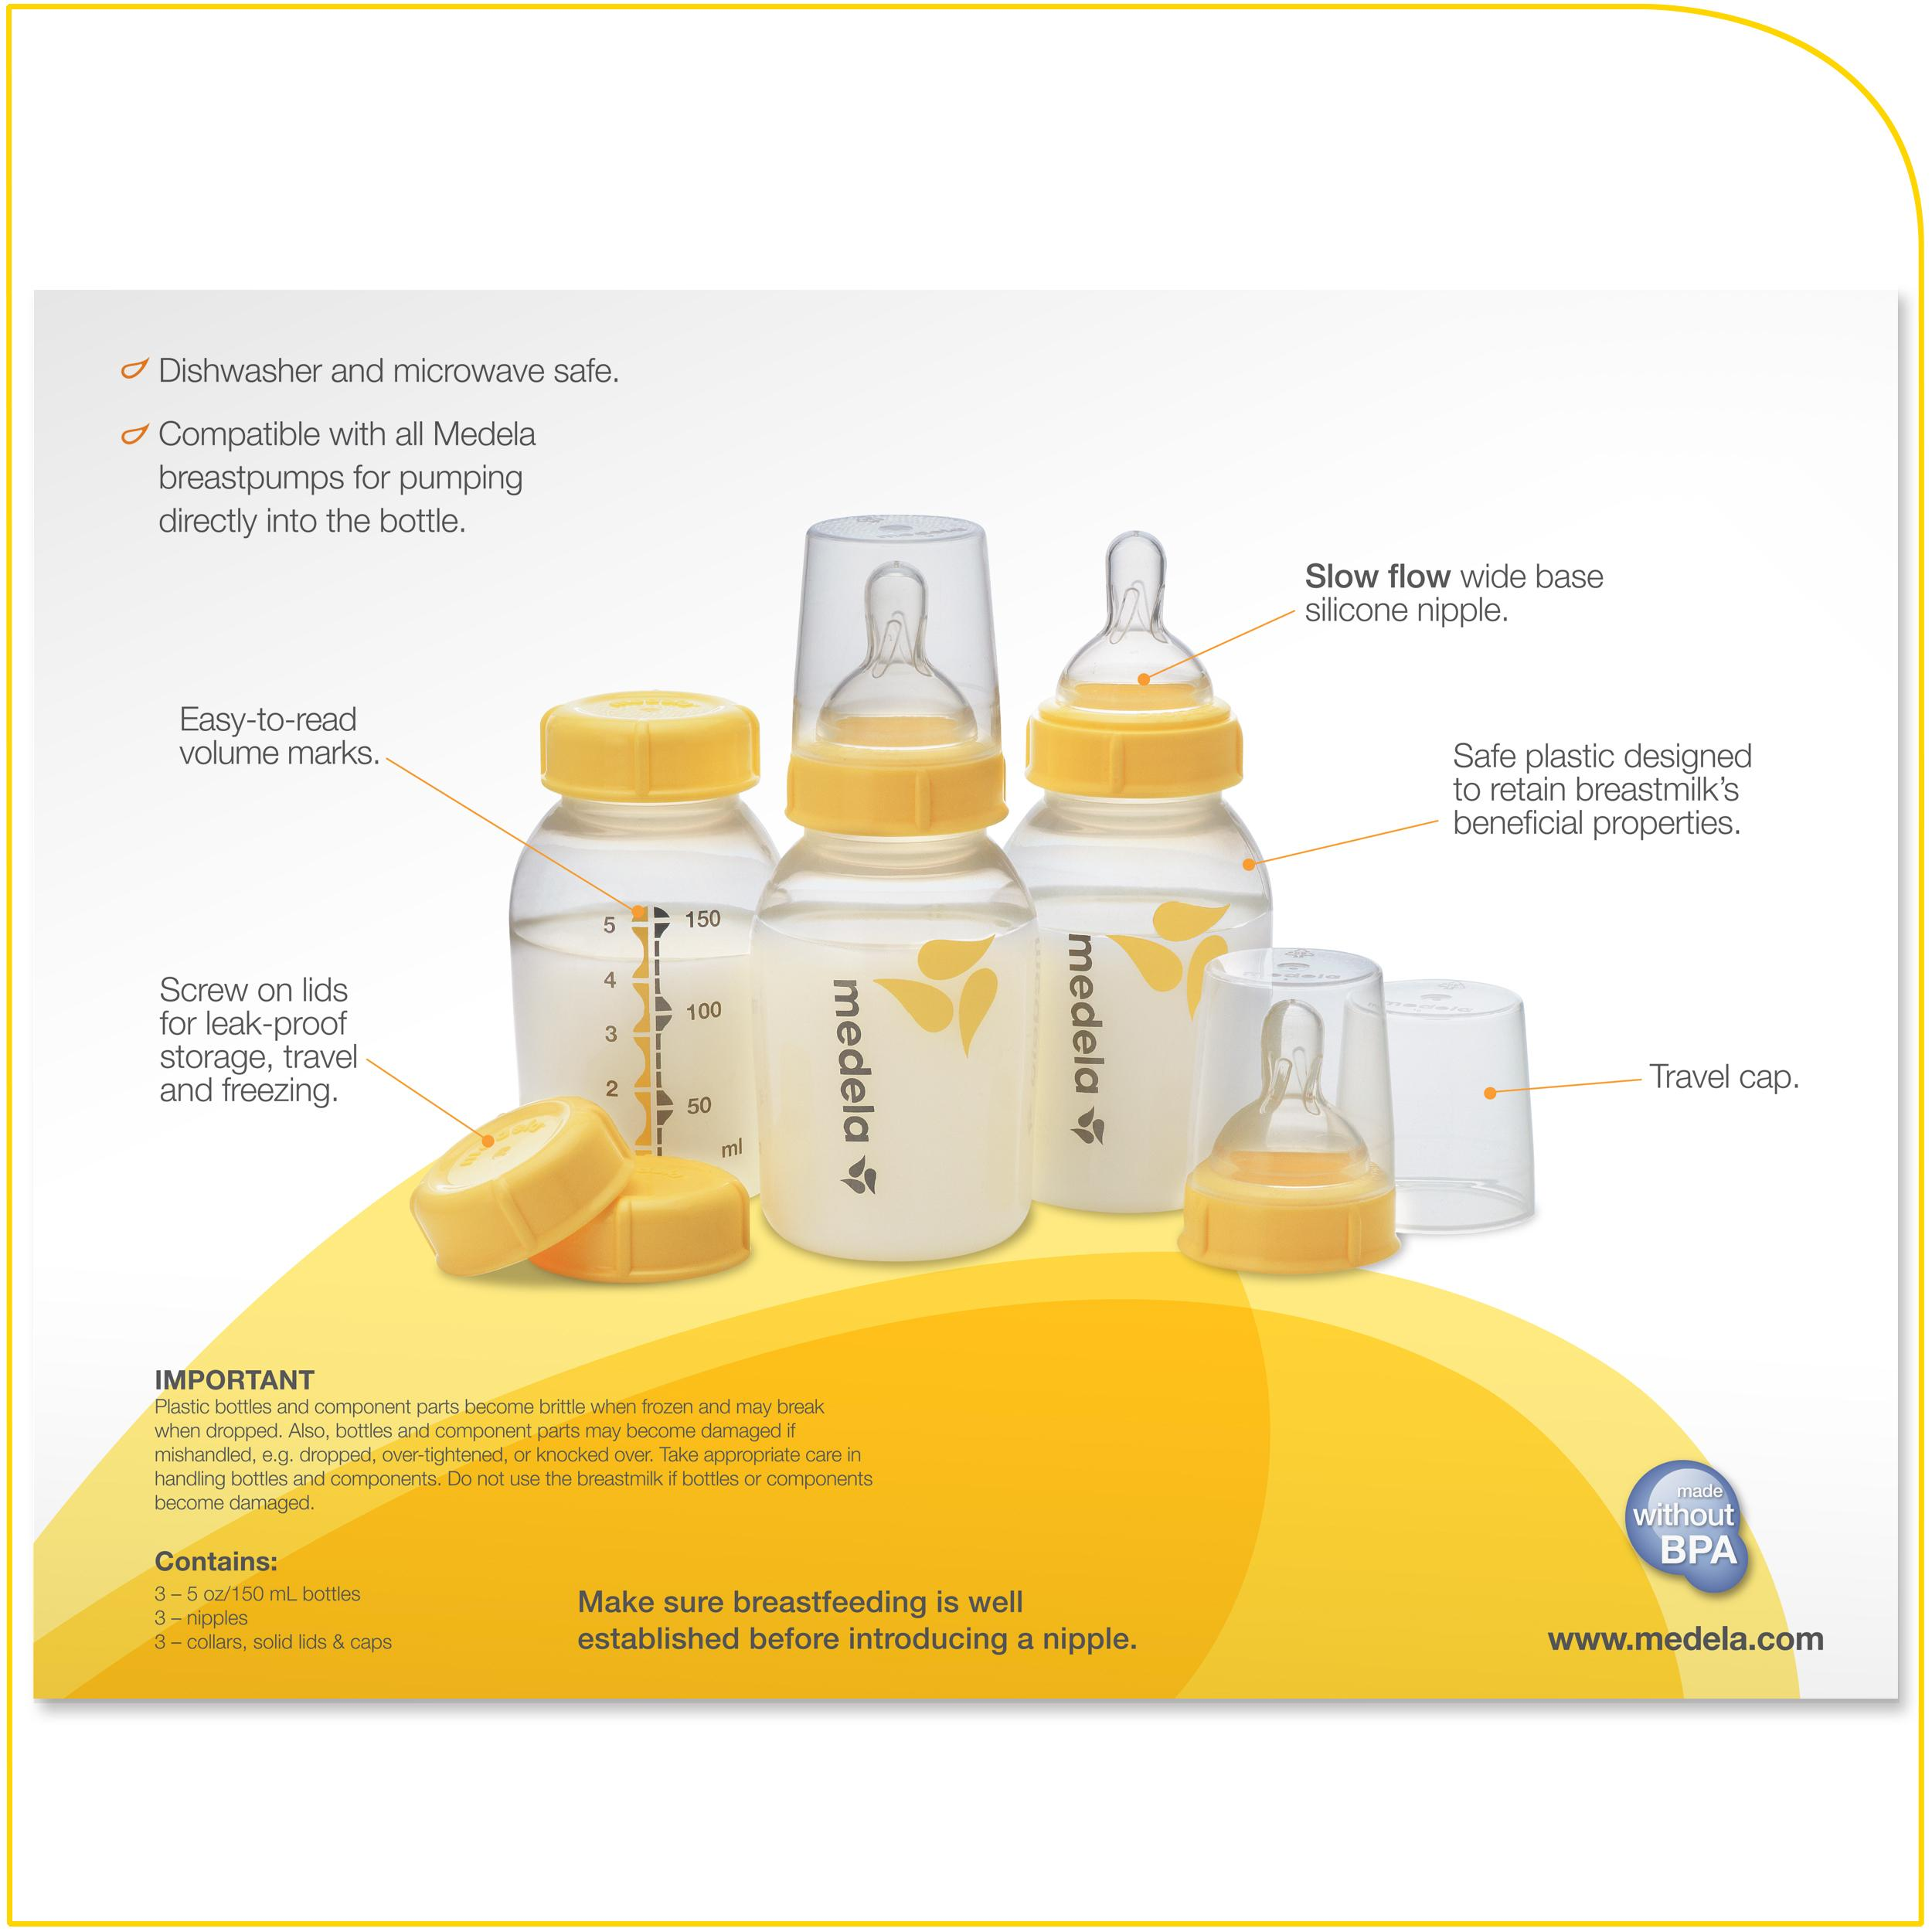 medela base manual breast pump